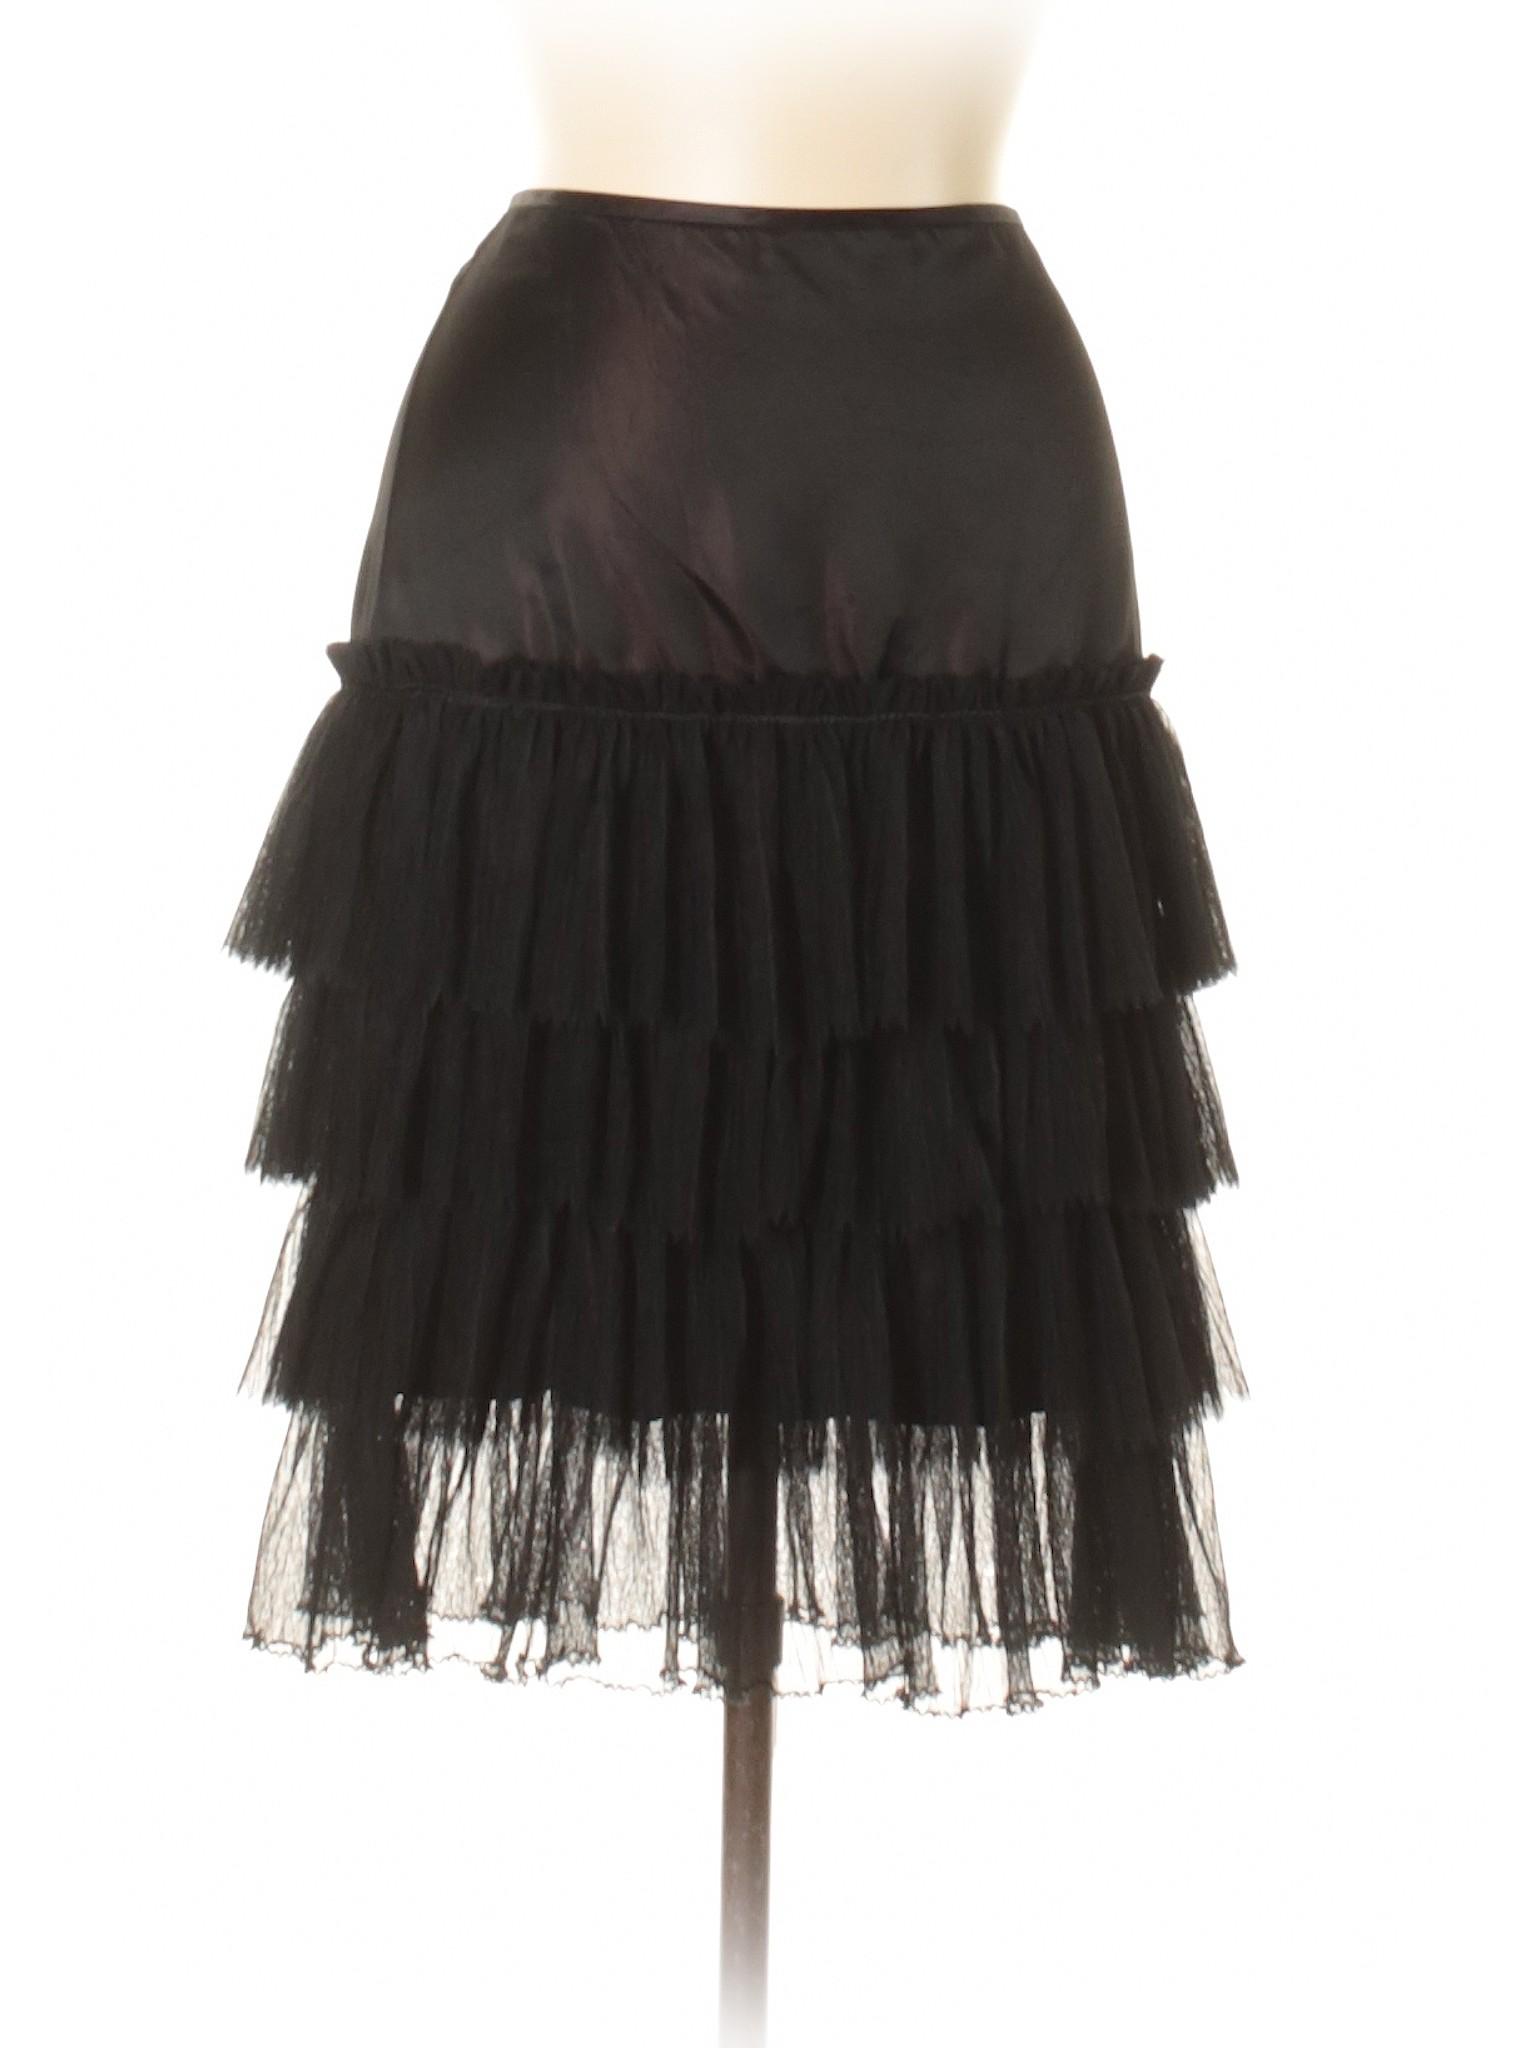 Skirt Boutique Boutique Boutique Boutique Boutique Skirt Skirt Casual Casual Skirt Casual Casual Casual Skirt Skirt Casual Boutique Boutique gAEpwH